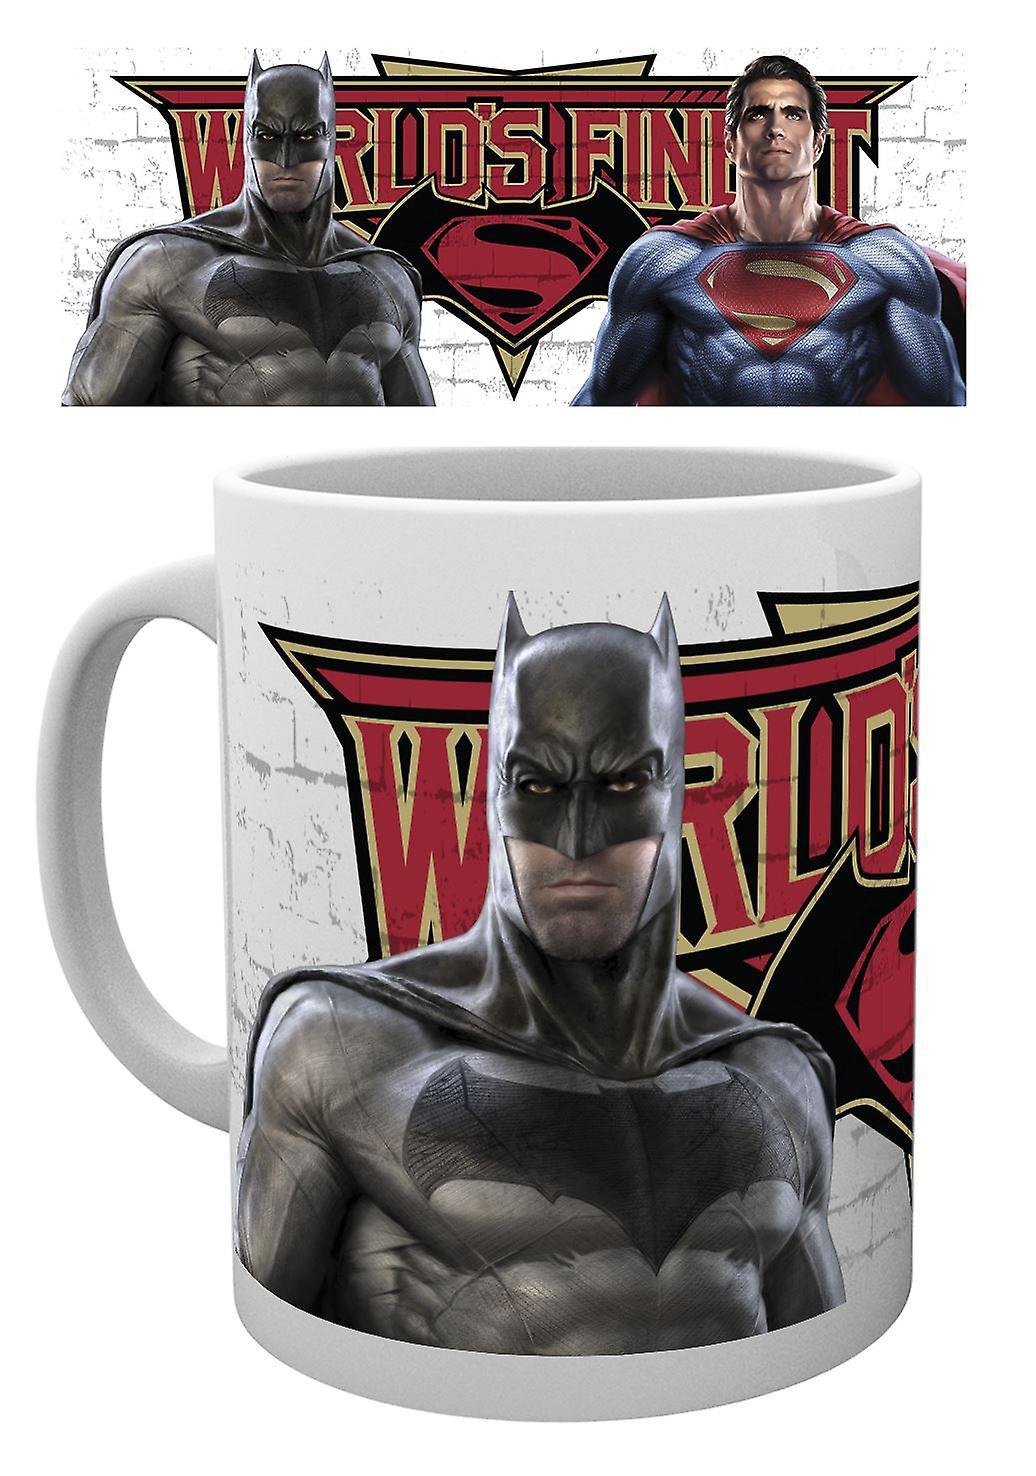 Batman Vs Superman verdens Fine krus